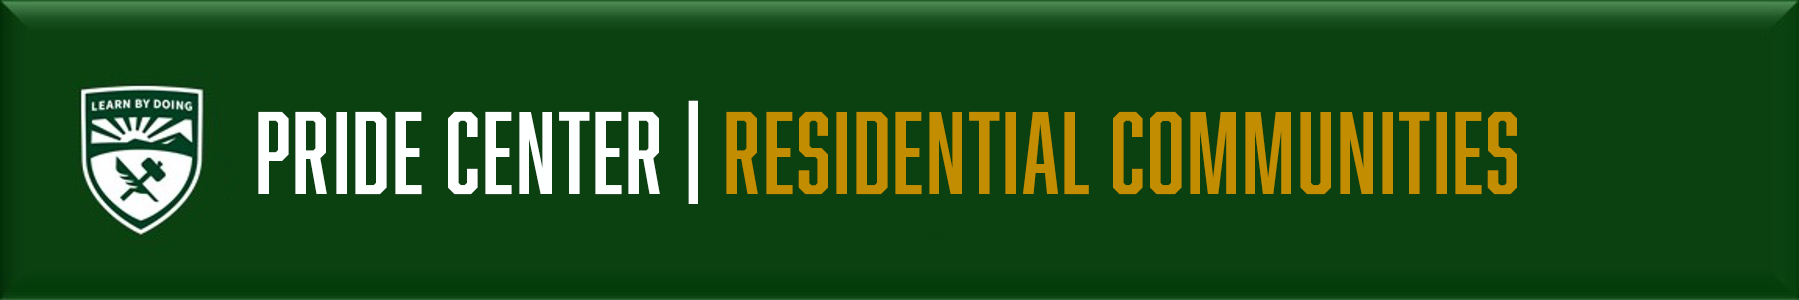 Pride Residential Learning Communities